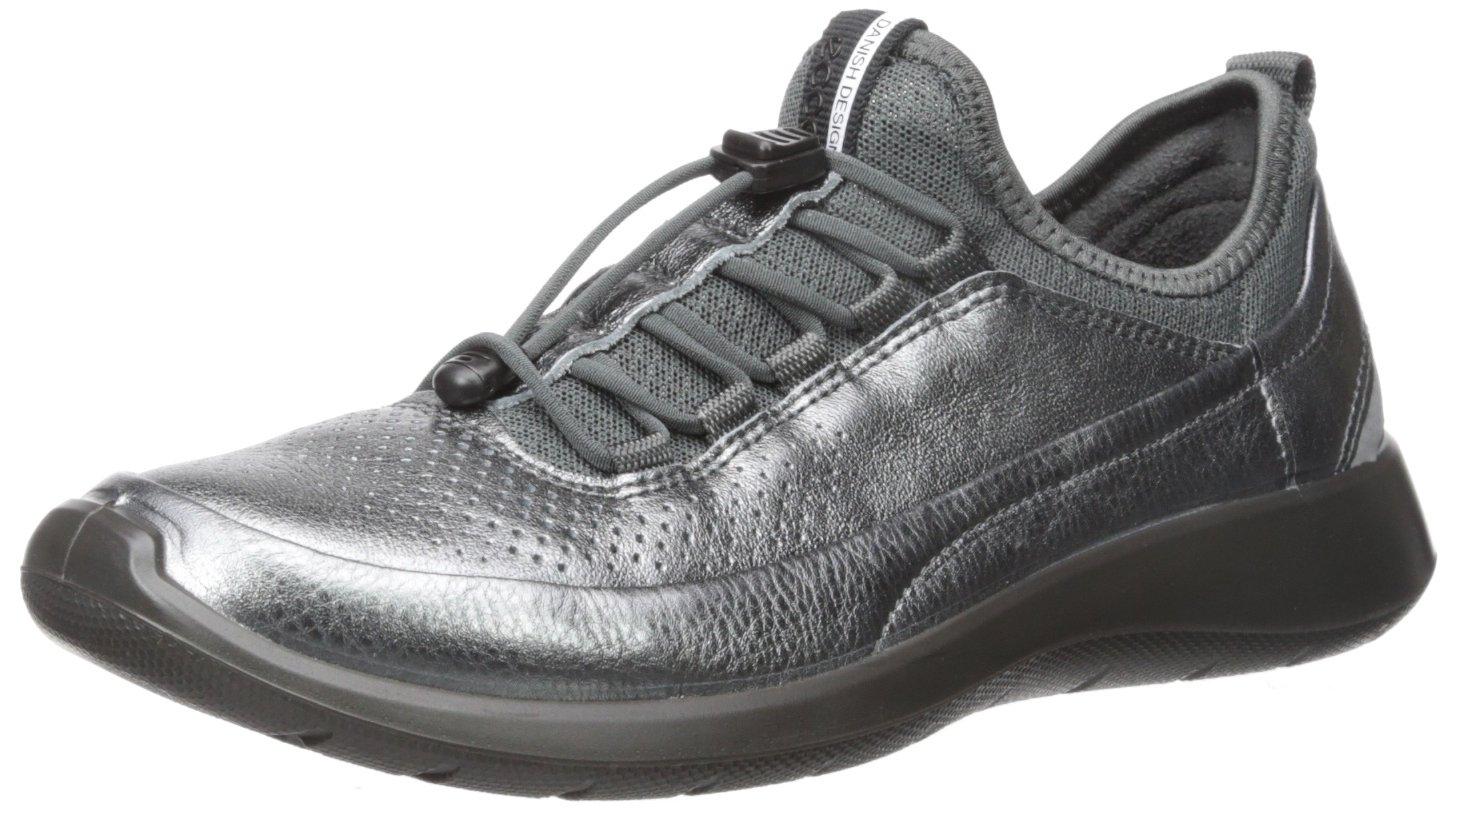 ECCO Women's Women's Soft 5 Toggle Fashion Sneaker, Dark Shadow/Dark Shadow, 39 EU/8-8.5 US